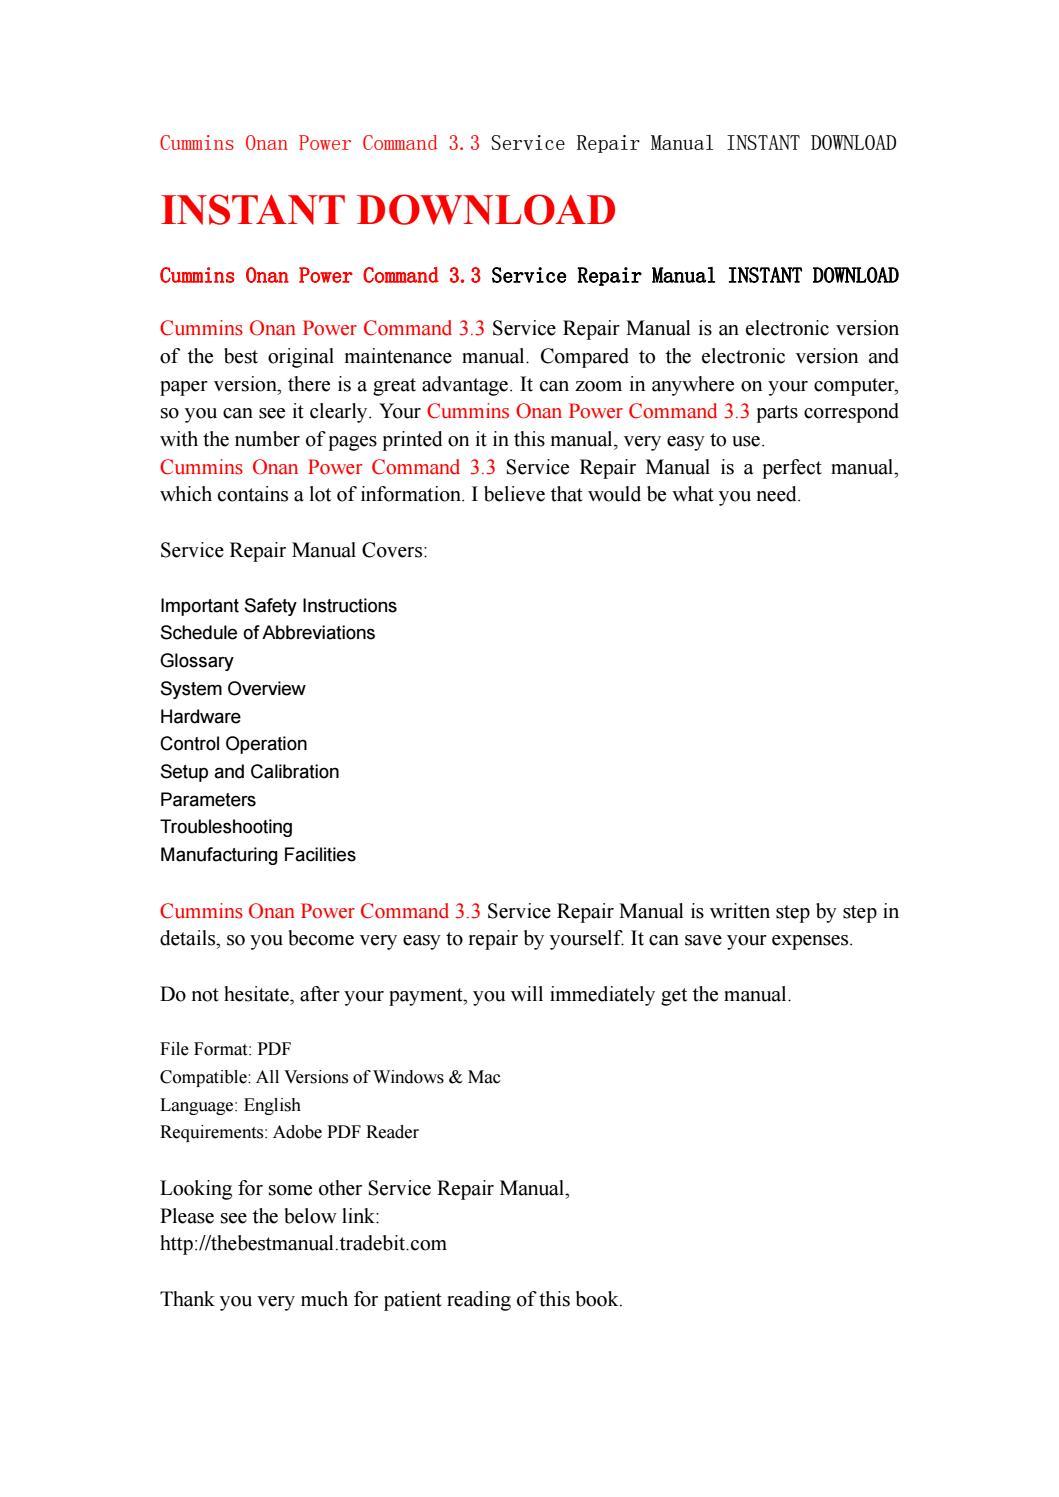 Cummins onan power command 3 3 service repair manual instant download by  kfjsjfnsef - issuu